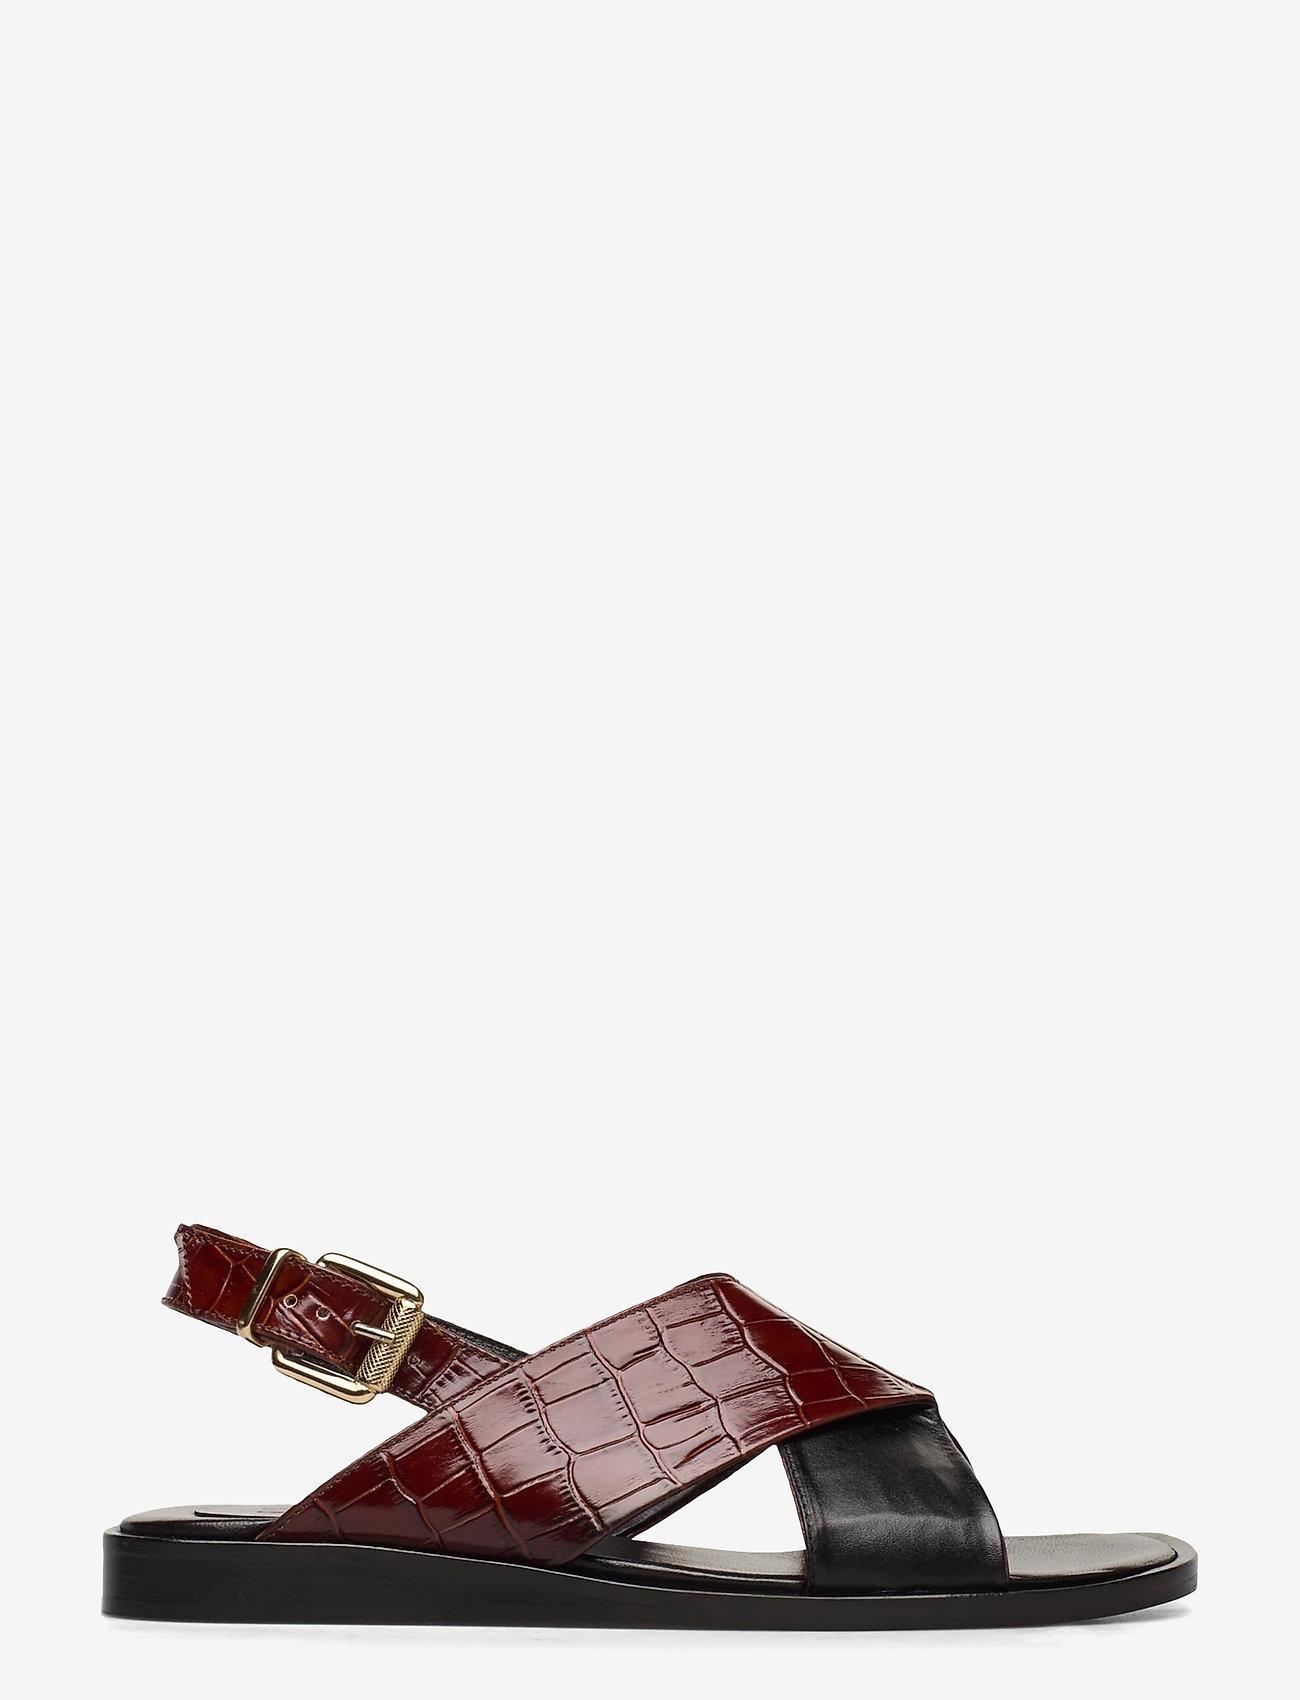 Billi Bi Slipper 4176 - Sandals